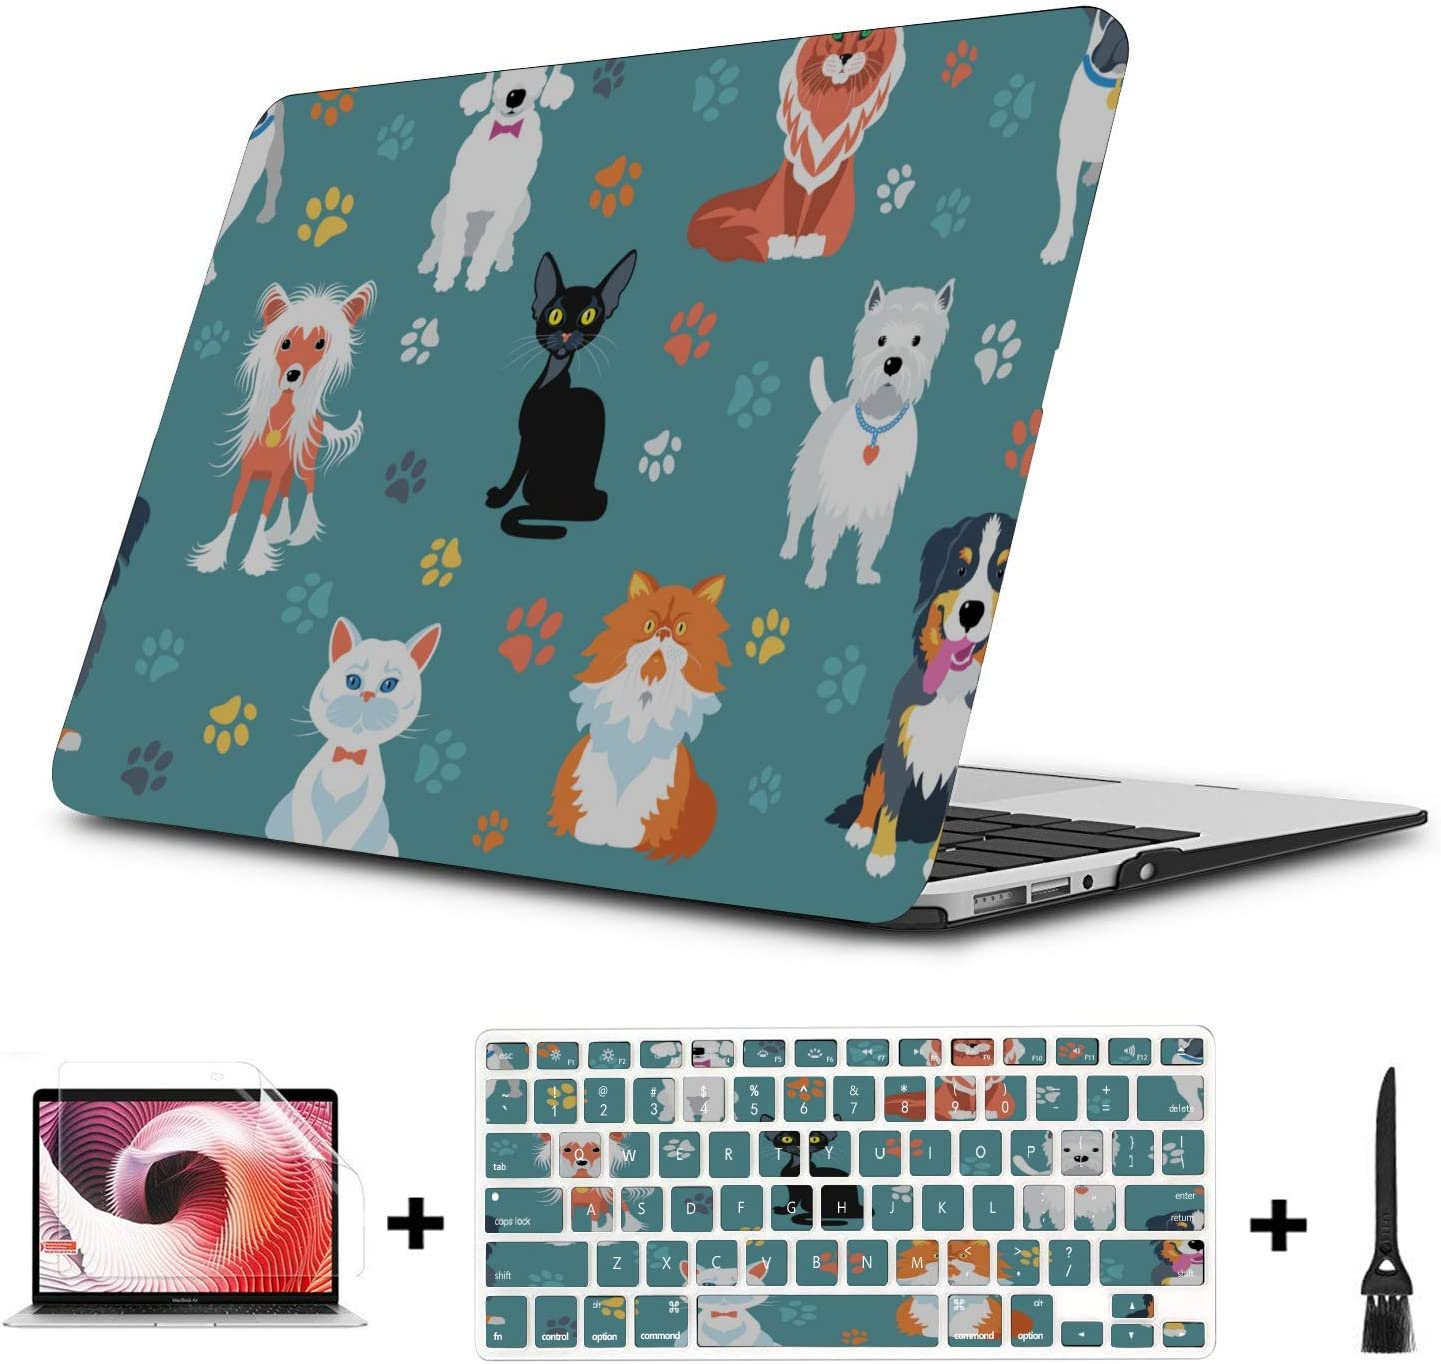 Case for MacBook Air Serious Creative Fashion Painting Plastic Hard Shell Compatible Mac Air 11 Pro 13 15 MacBook Air 2017 Case Protection for MacBook 2016-2019 Version